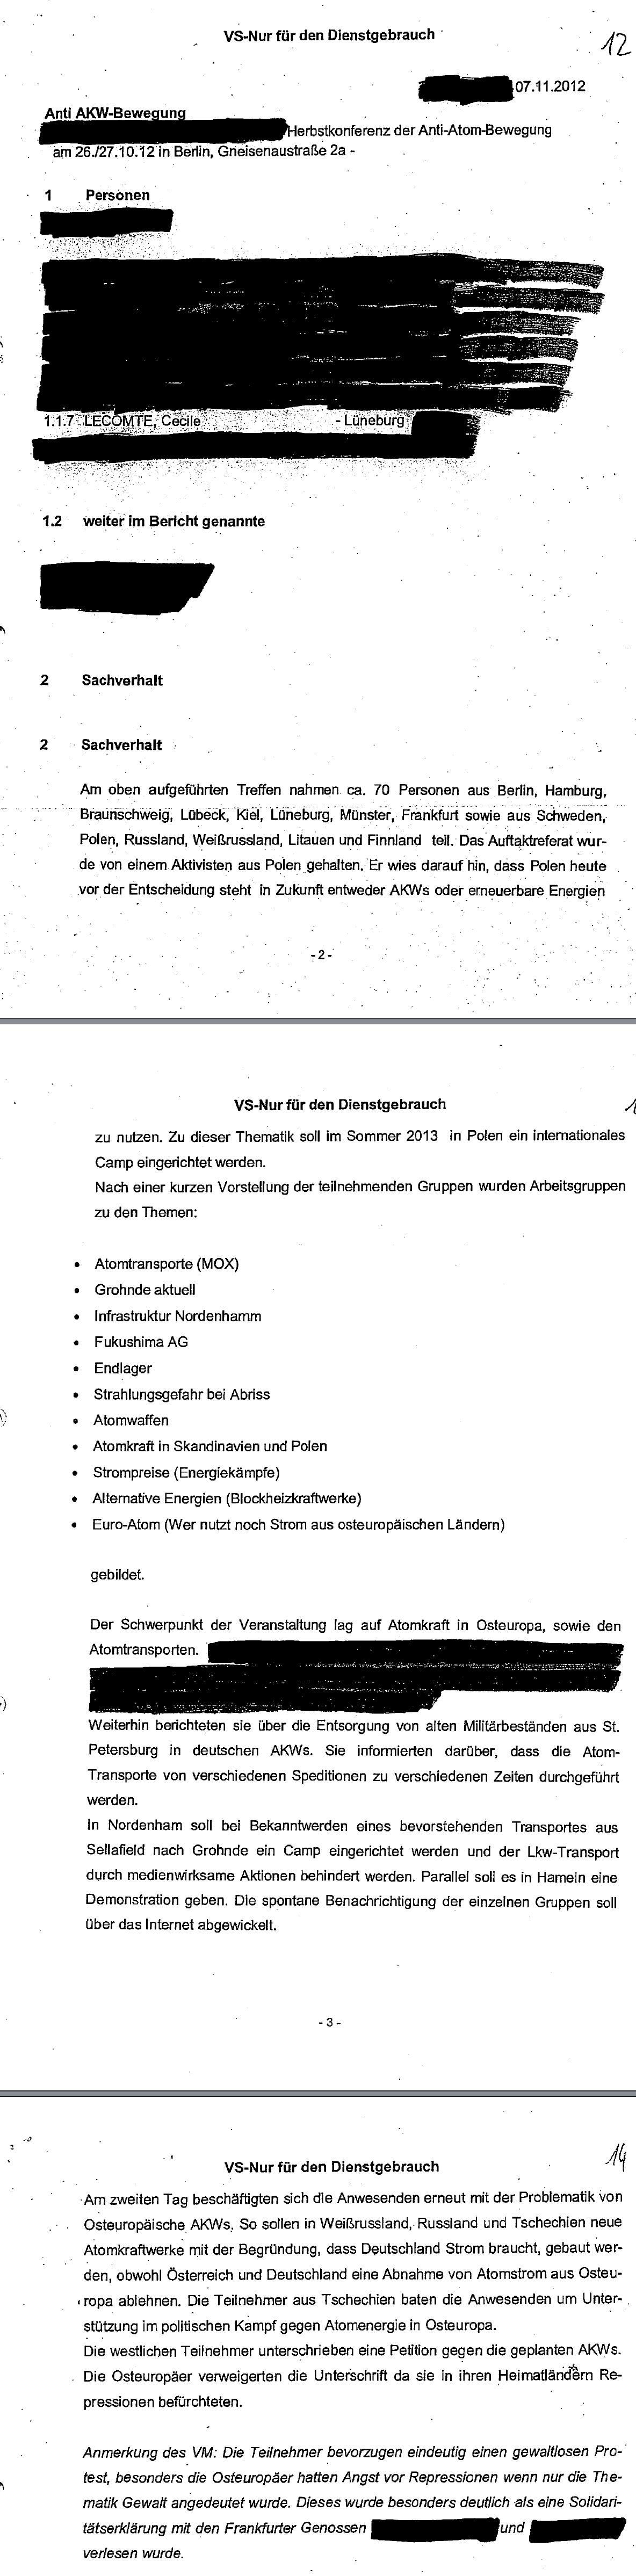 Bericht zur aak Berlin 2012